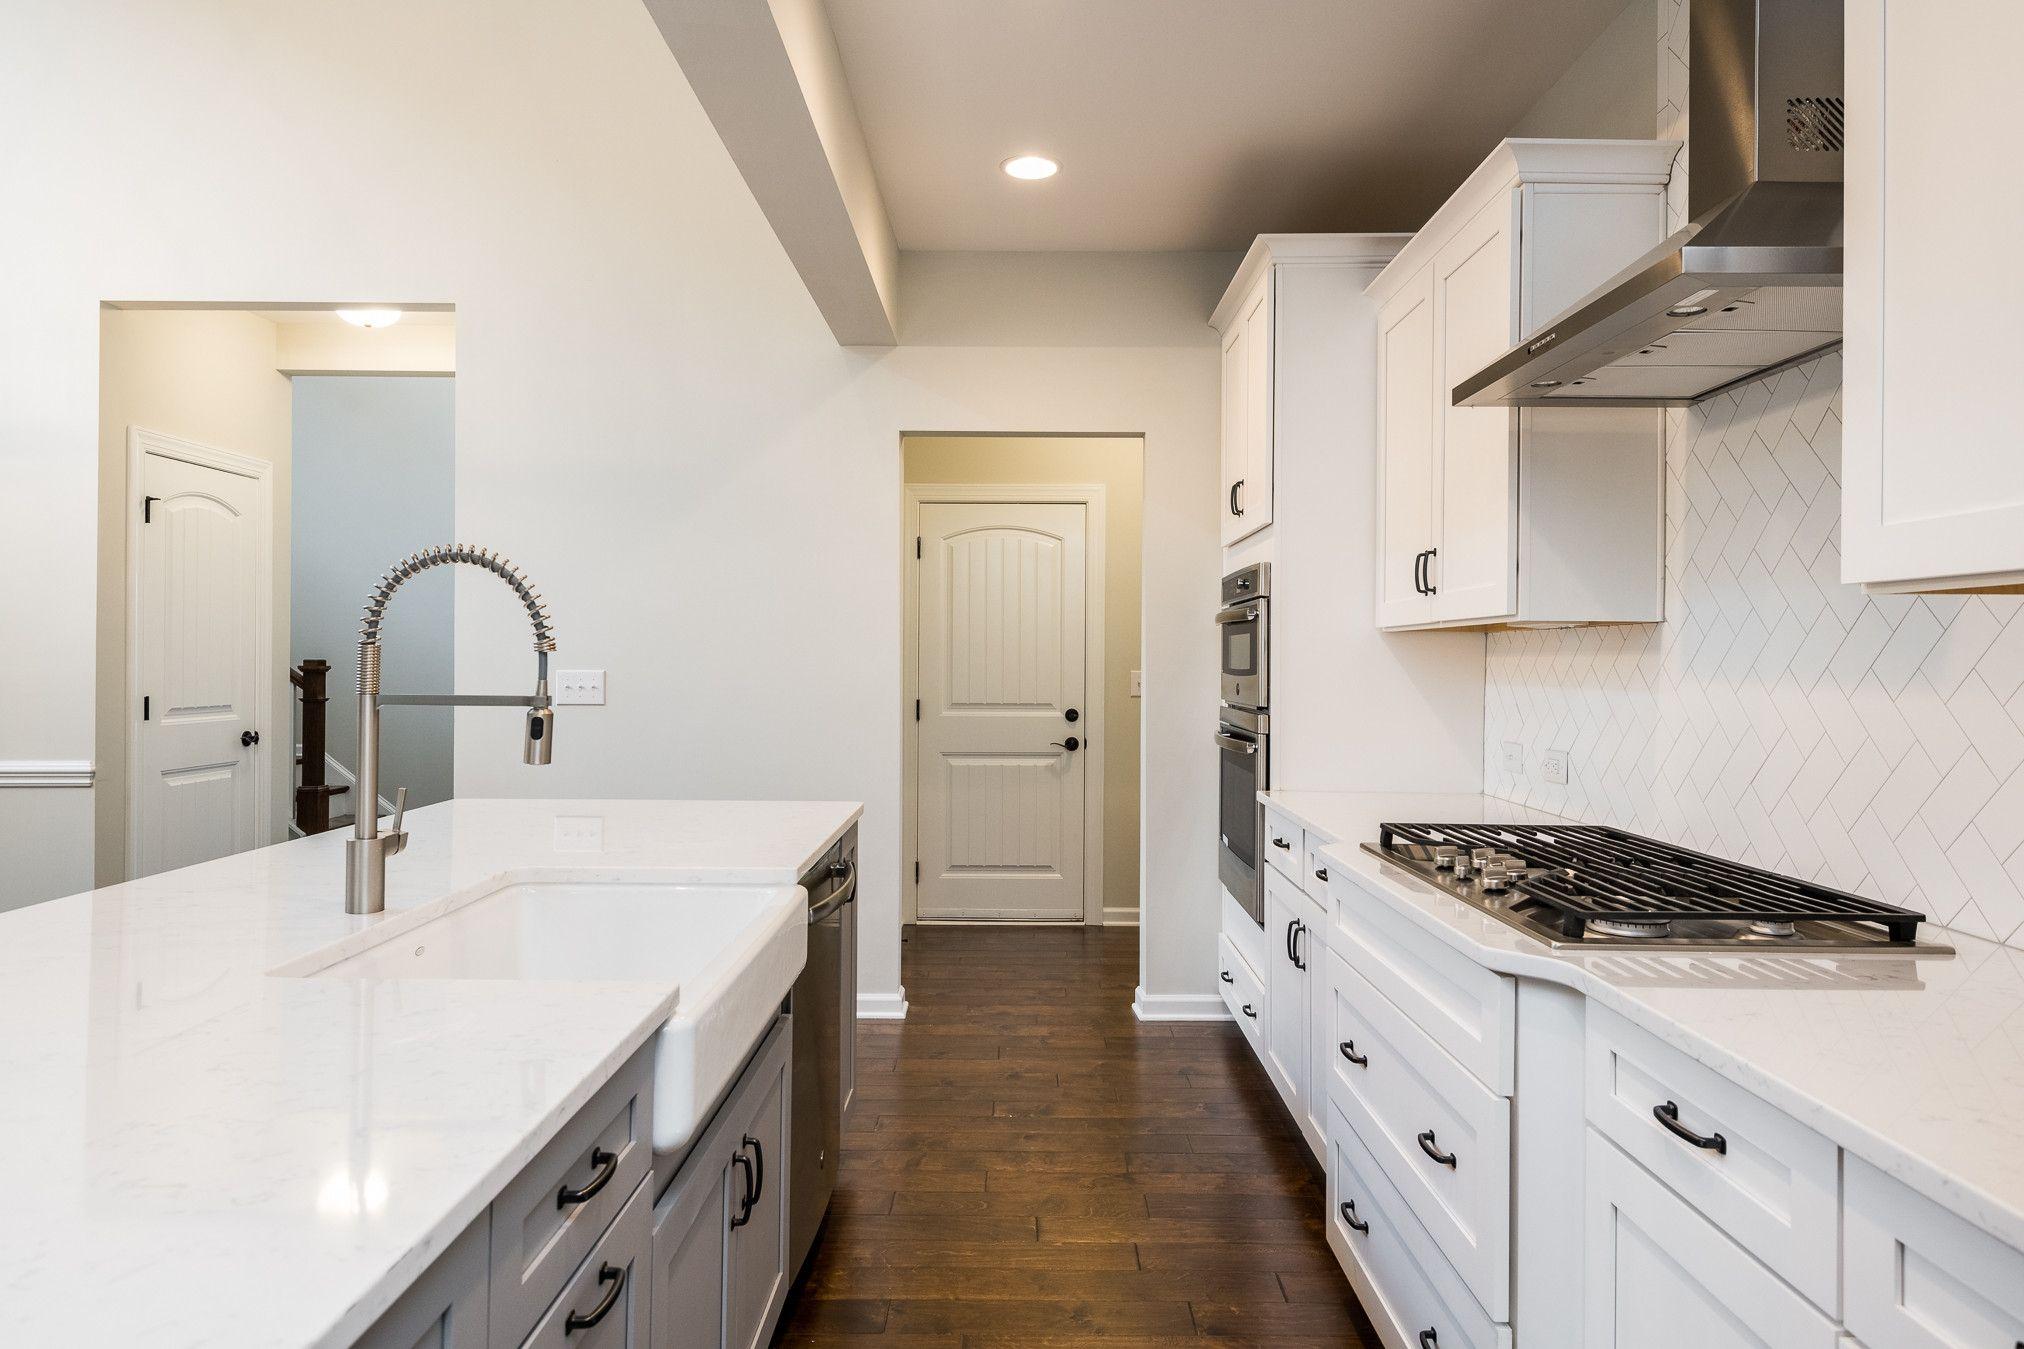 Kitchen-in-Cassidy-at-Lantana-in-Huntersville